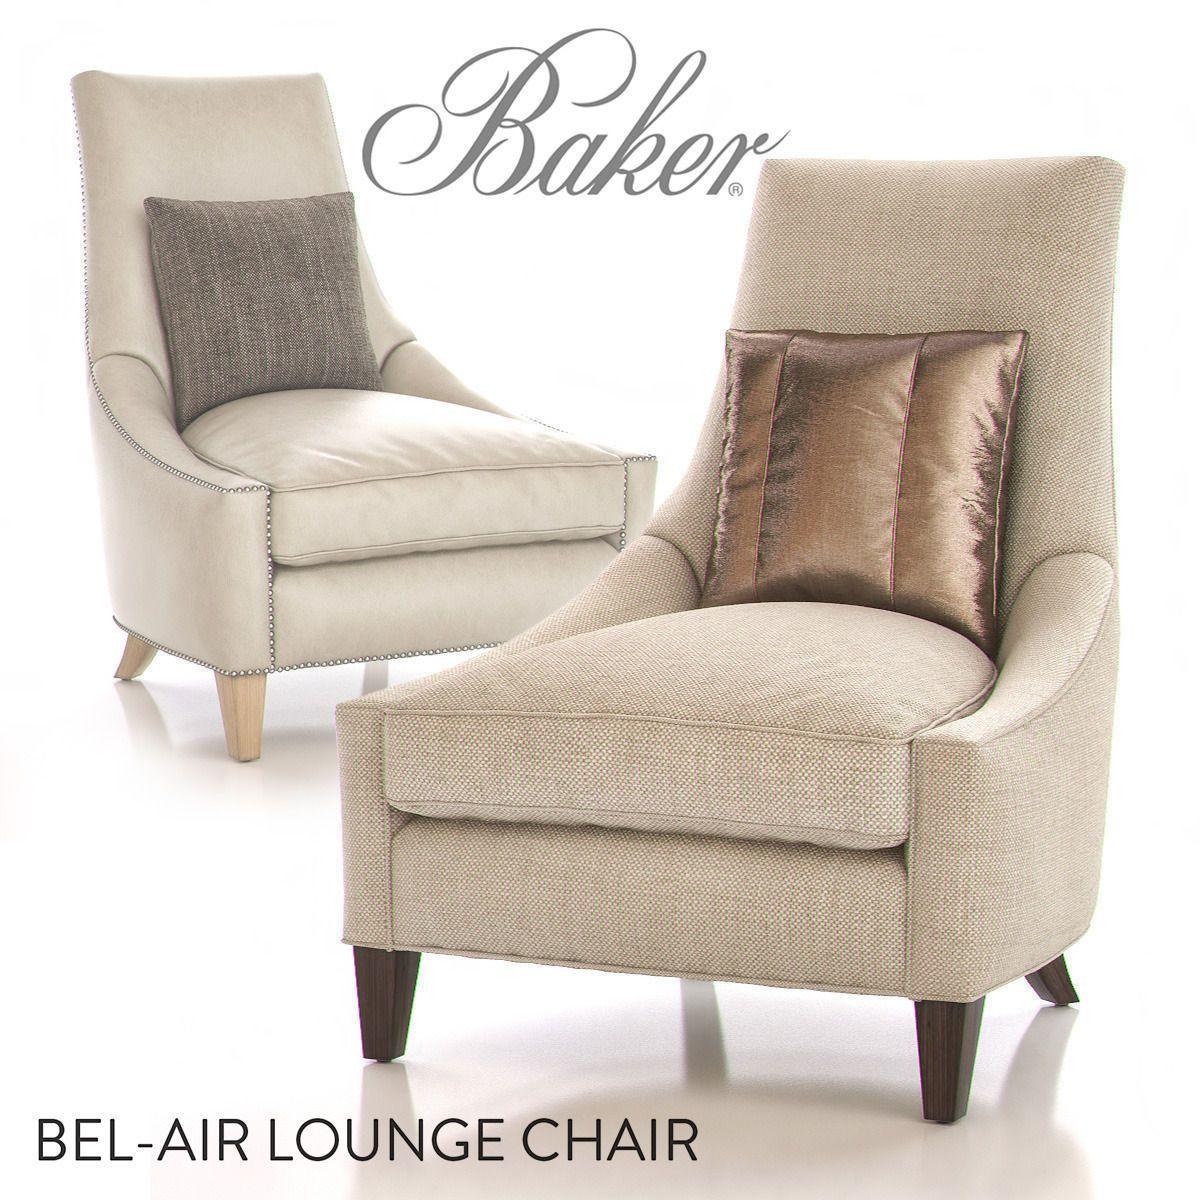 Baker Bel Air Lounge Chair 3D Model MAX   CGTrader.com